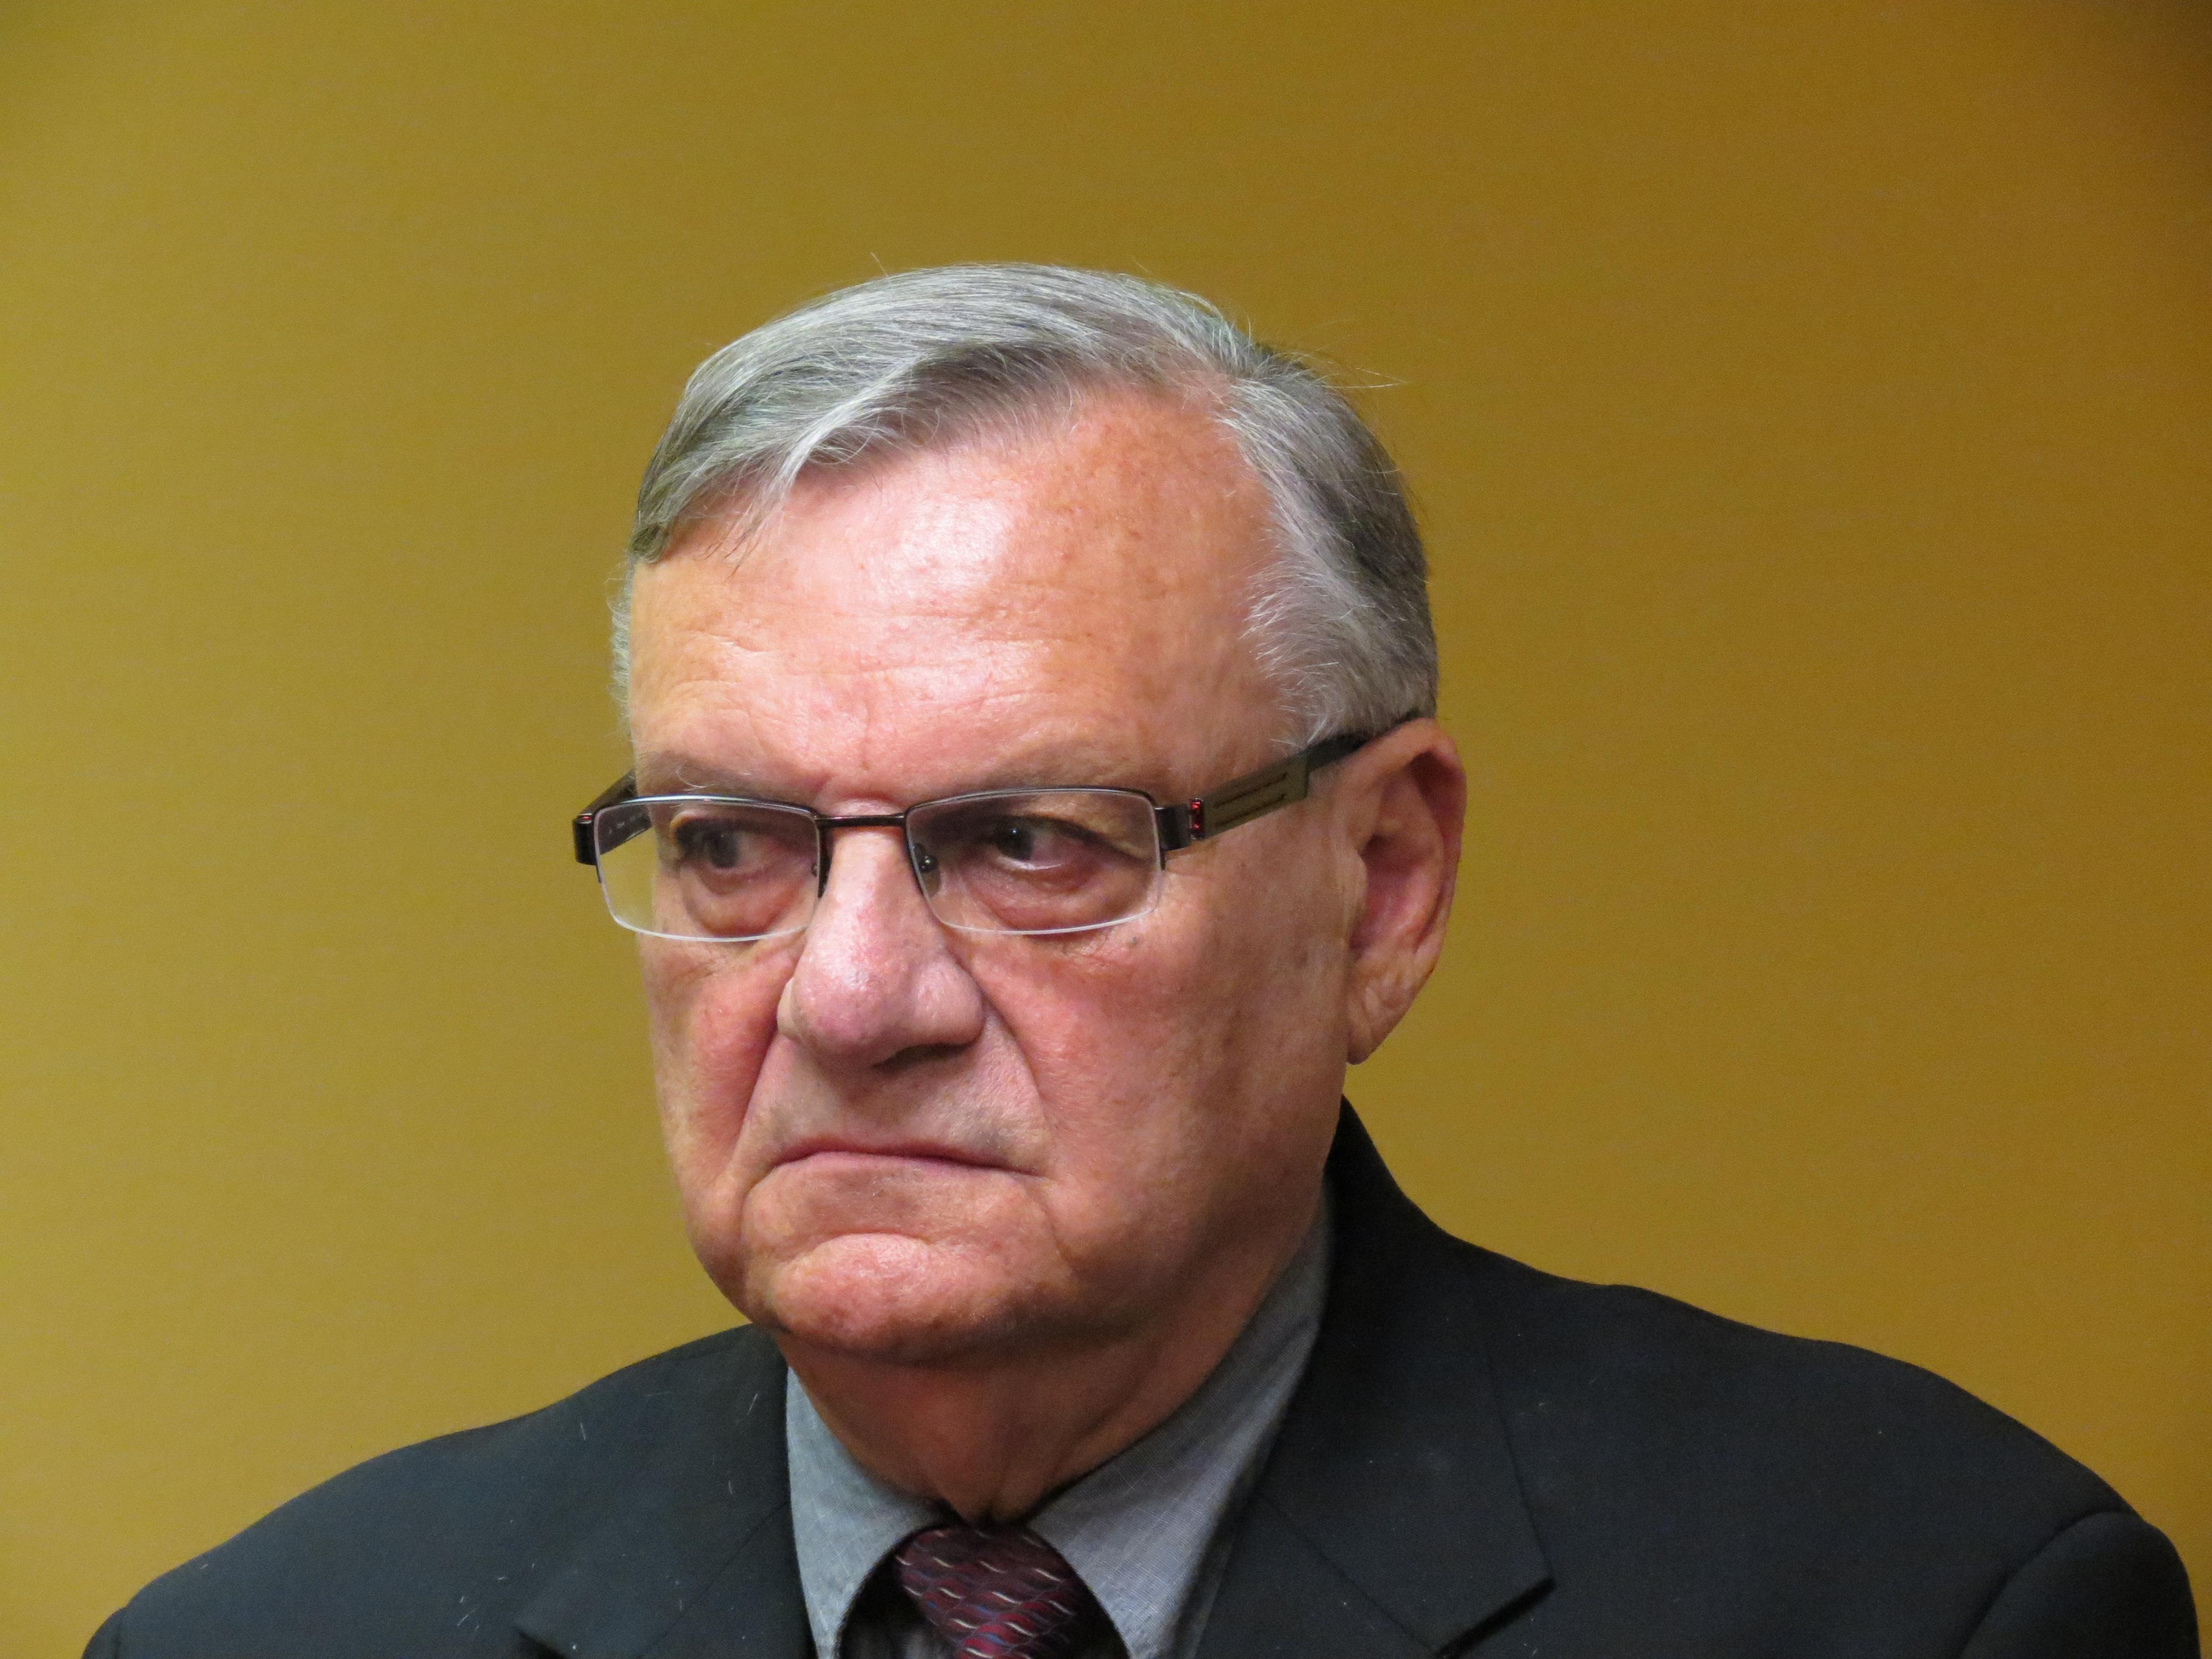 Joe Arpaio